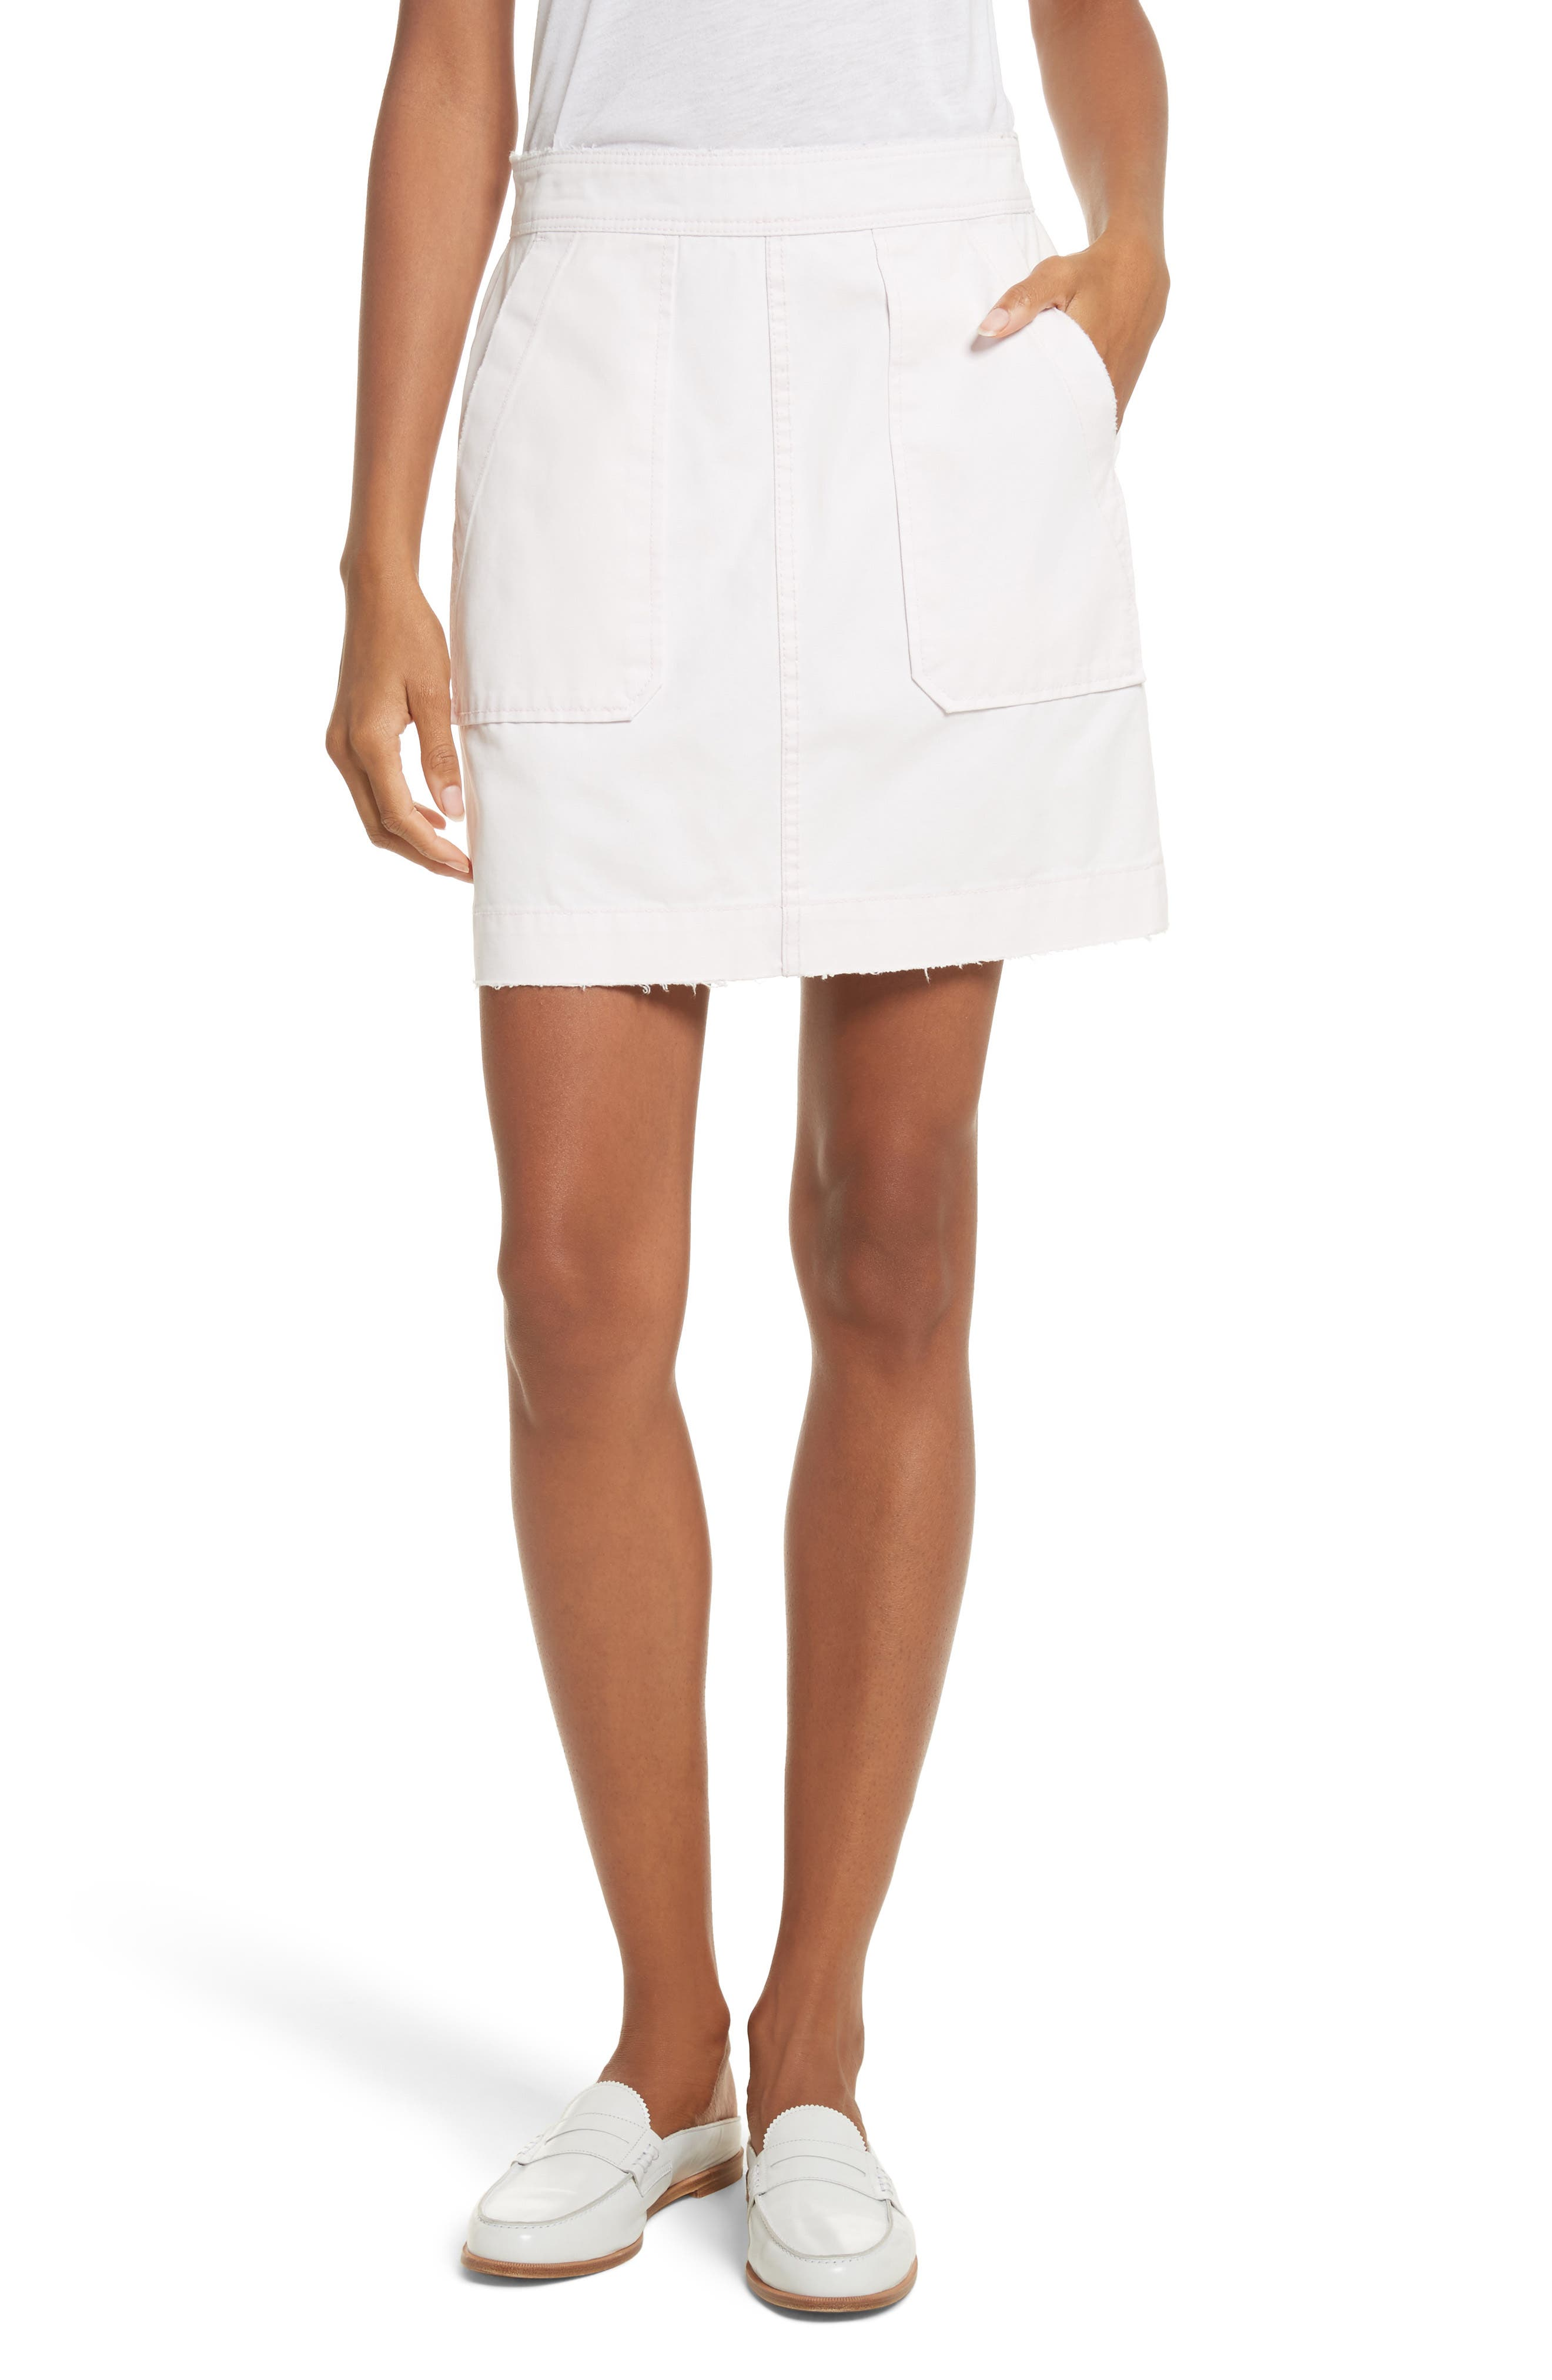 La Vie Rebecca Taylor Army Twill Skirt